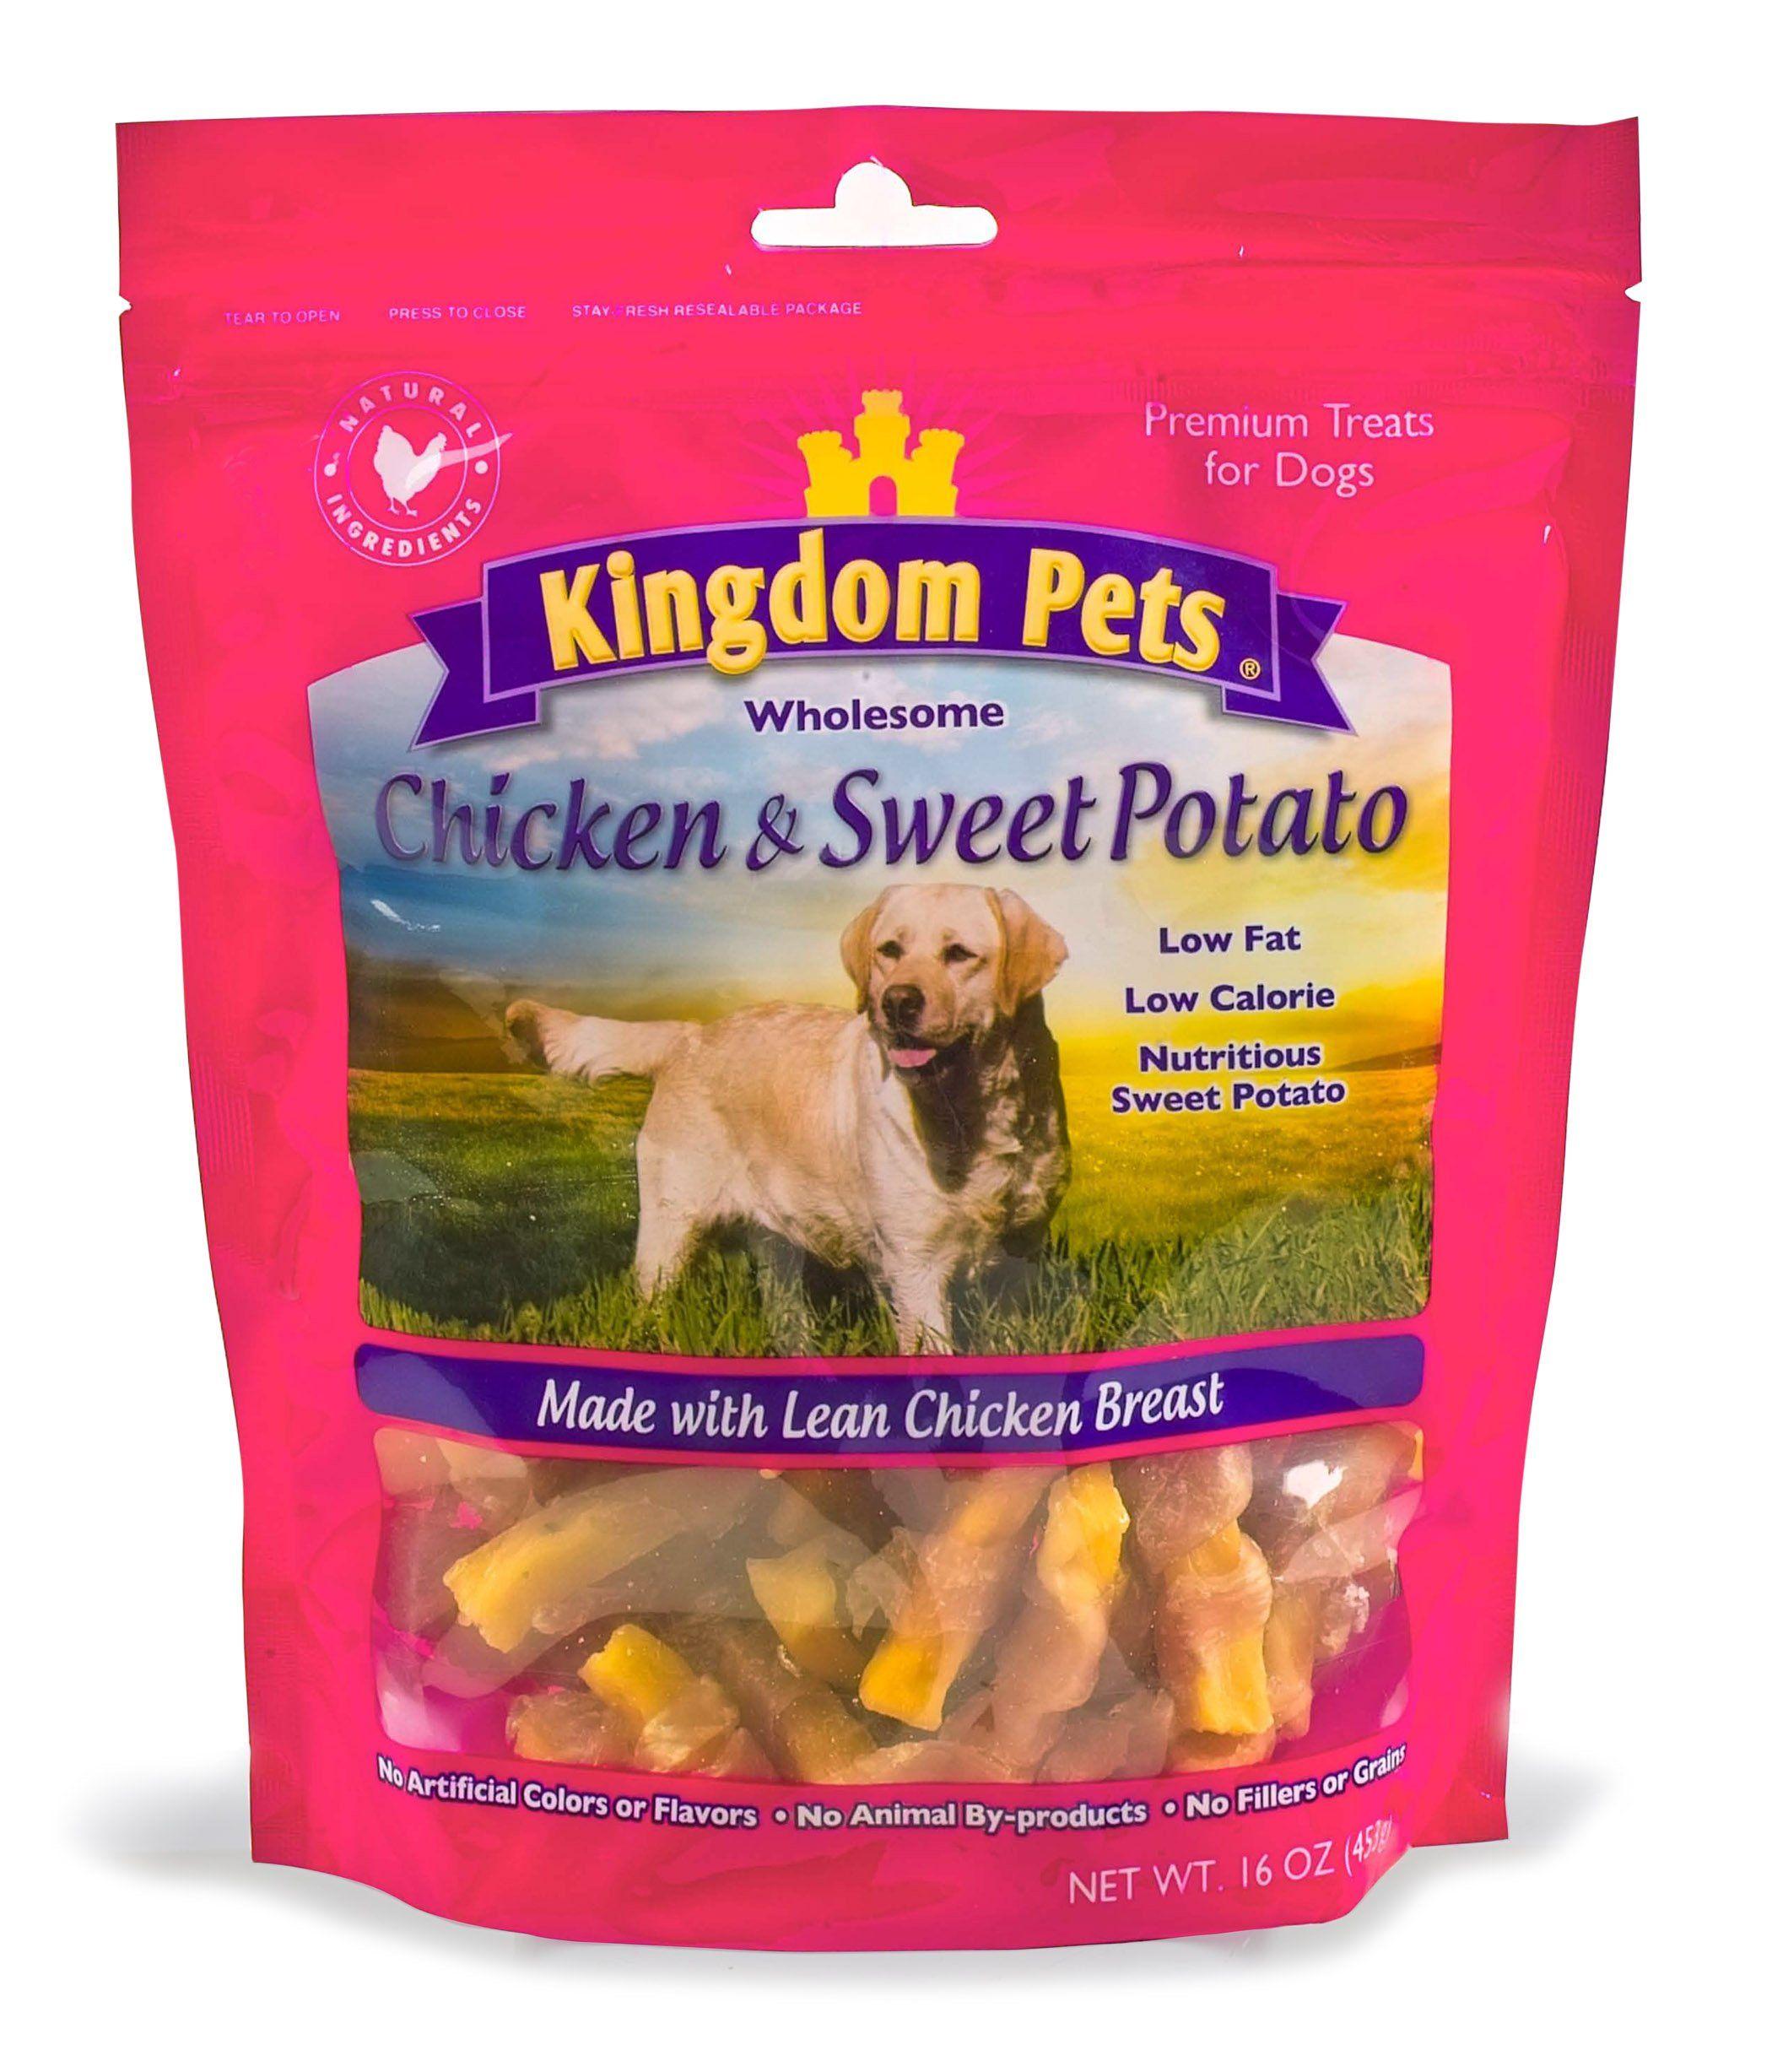 Kingdom Pets Premium Dog Treats Chicken and Sweet Potato